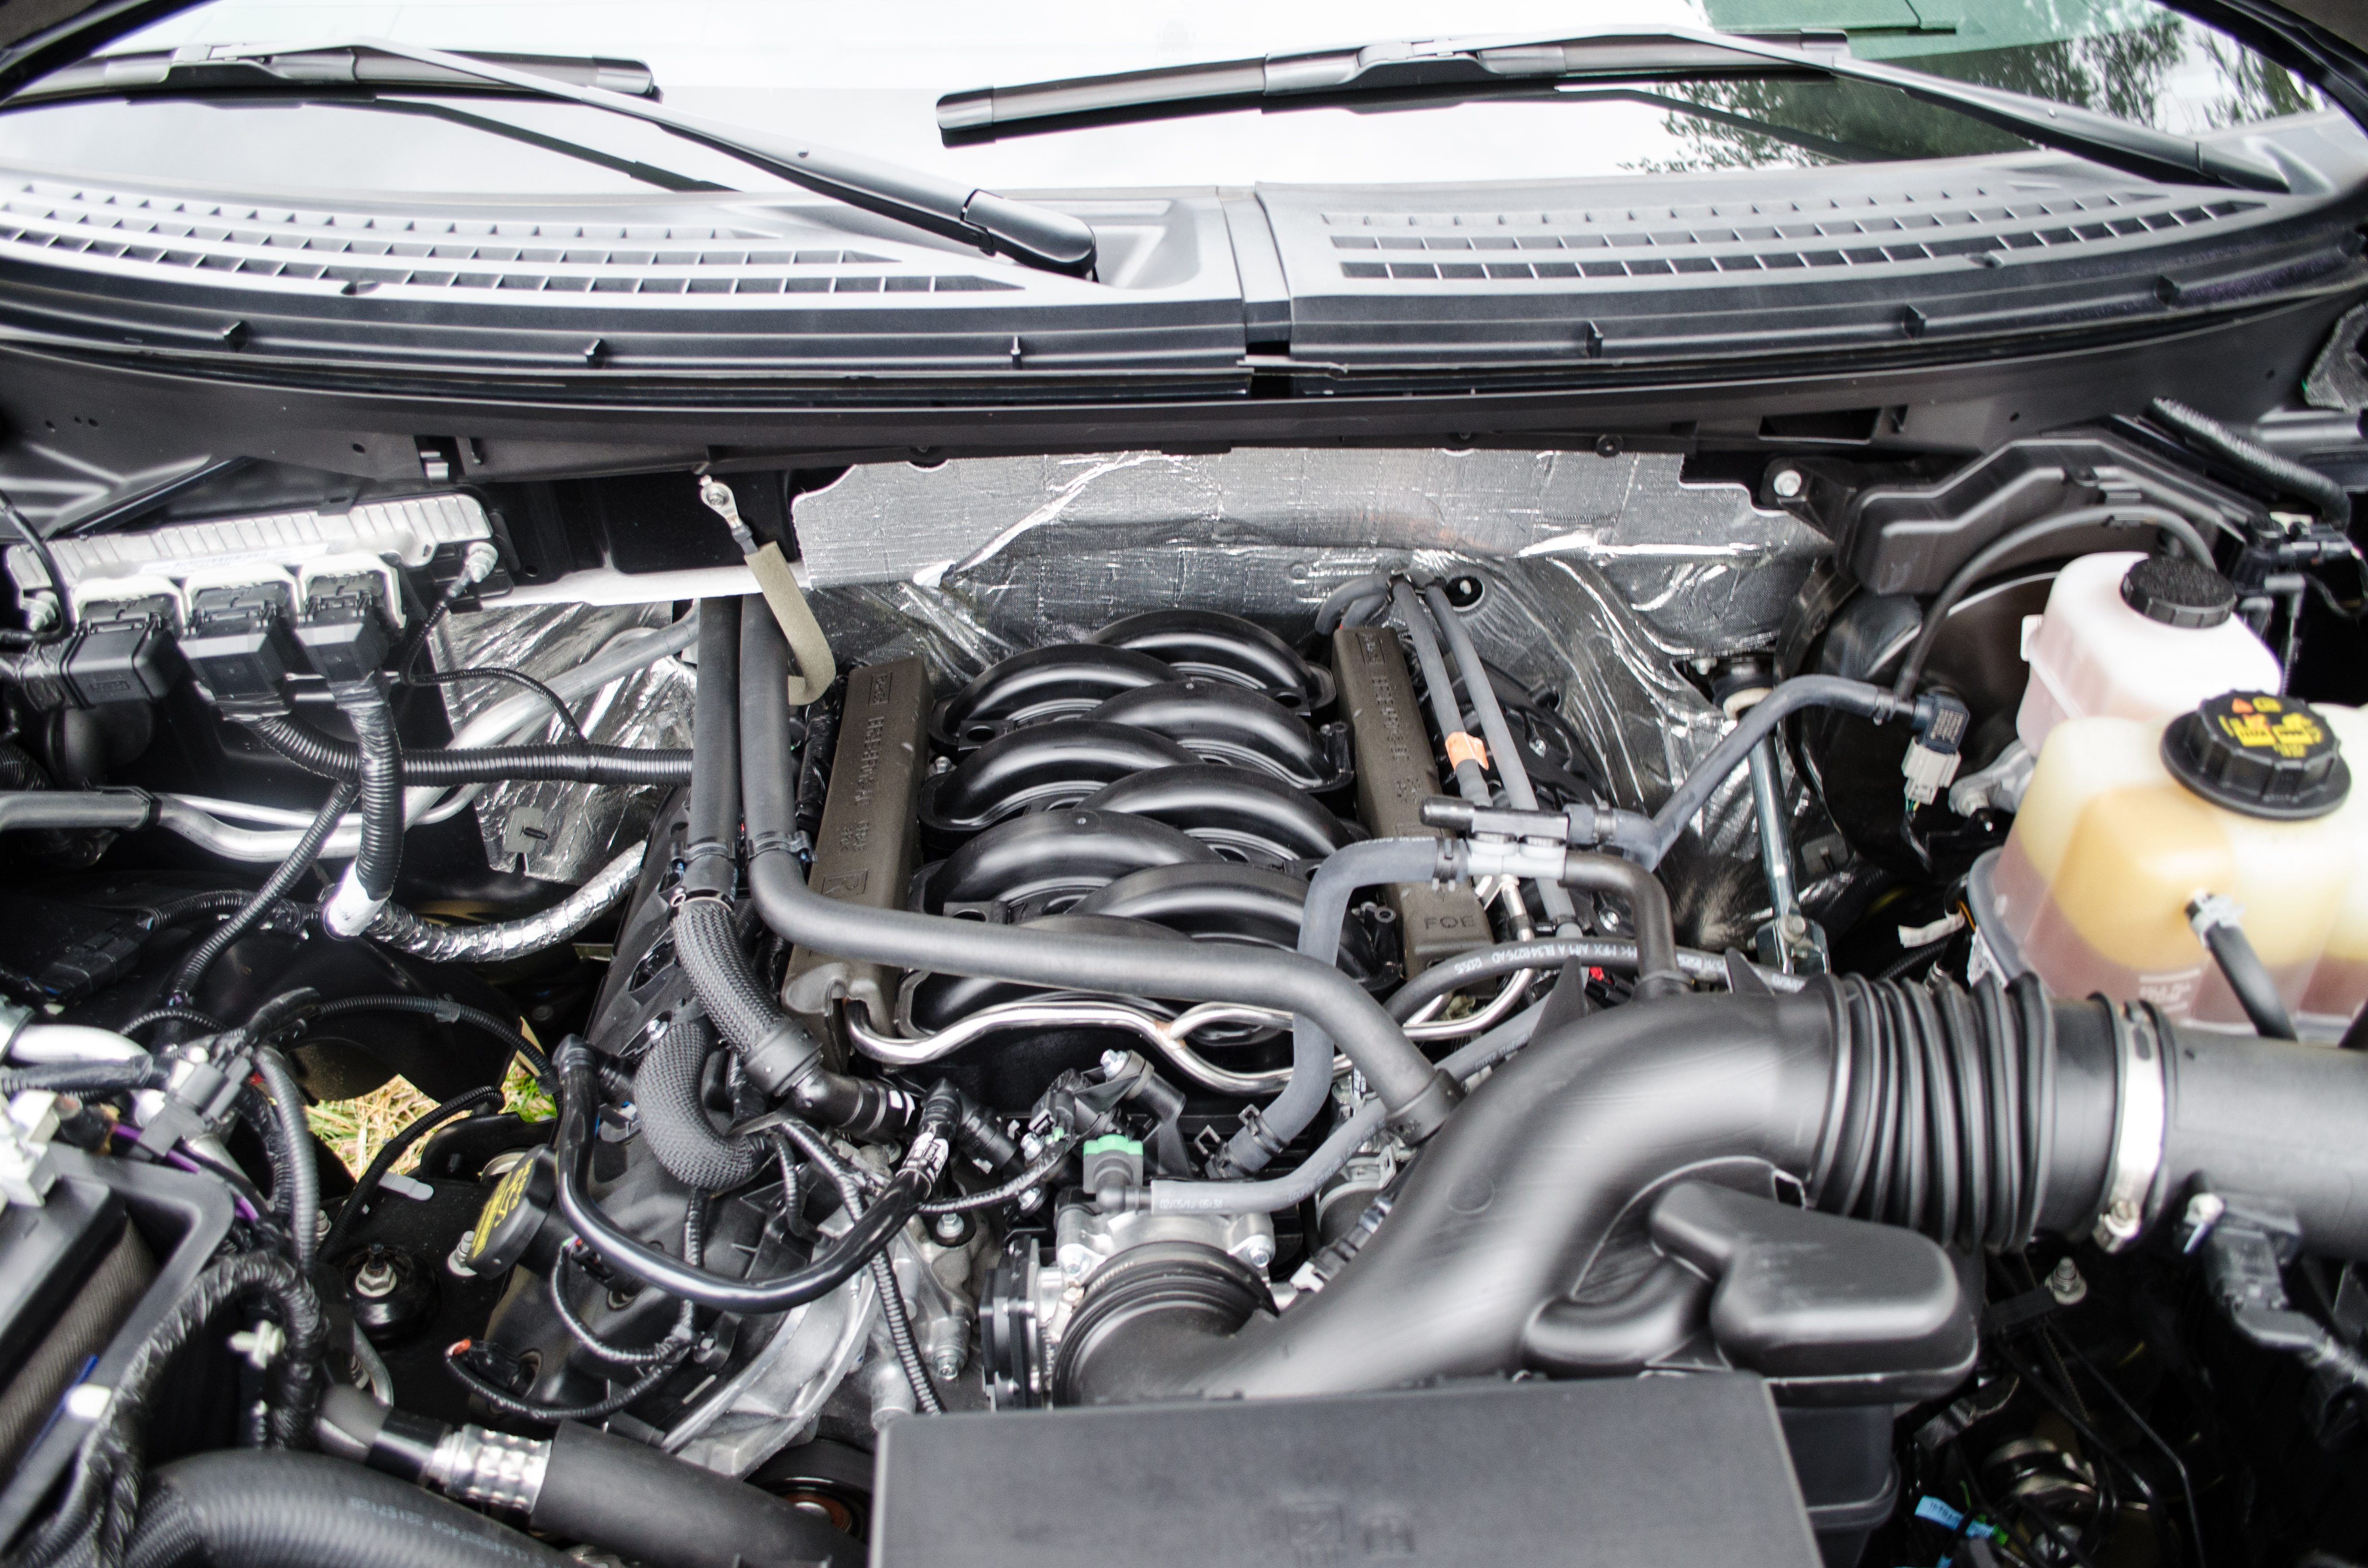 Ford 5 0 Engine Diagram Guide And Troubleshooting Of Wiring Mercruiser 2015 F 150 Diagrams Rh 42 Jennifer Retzke De 2002 Explorer